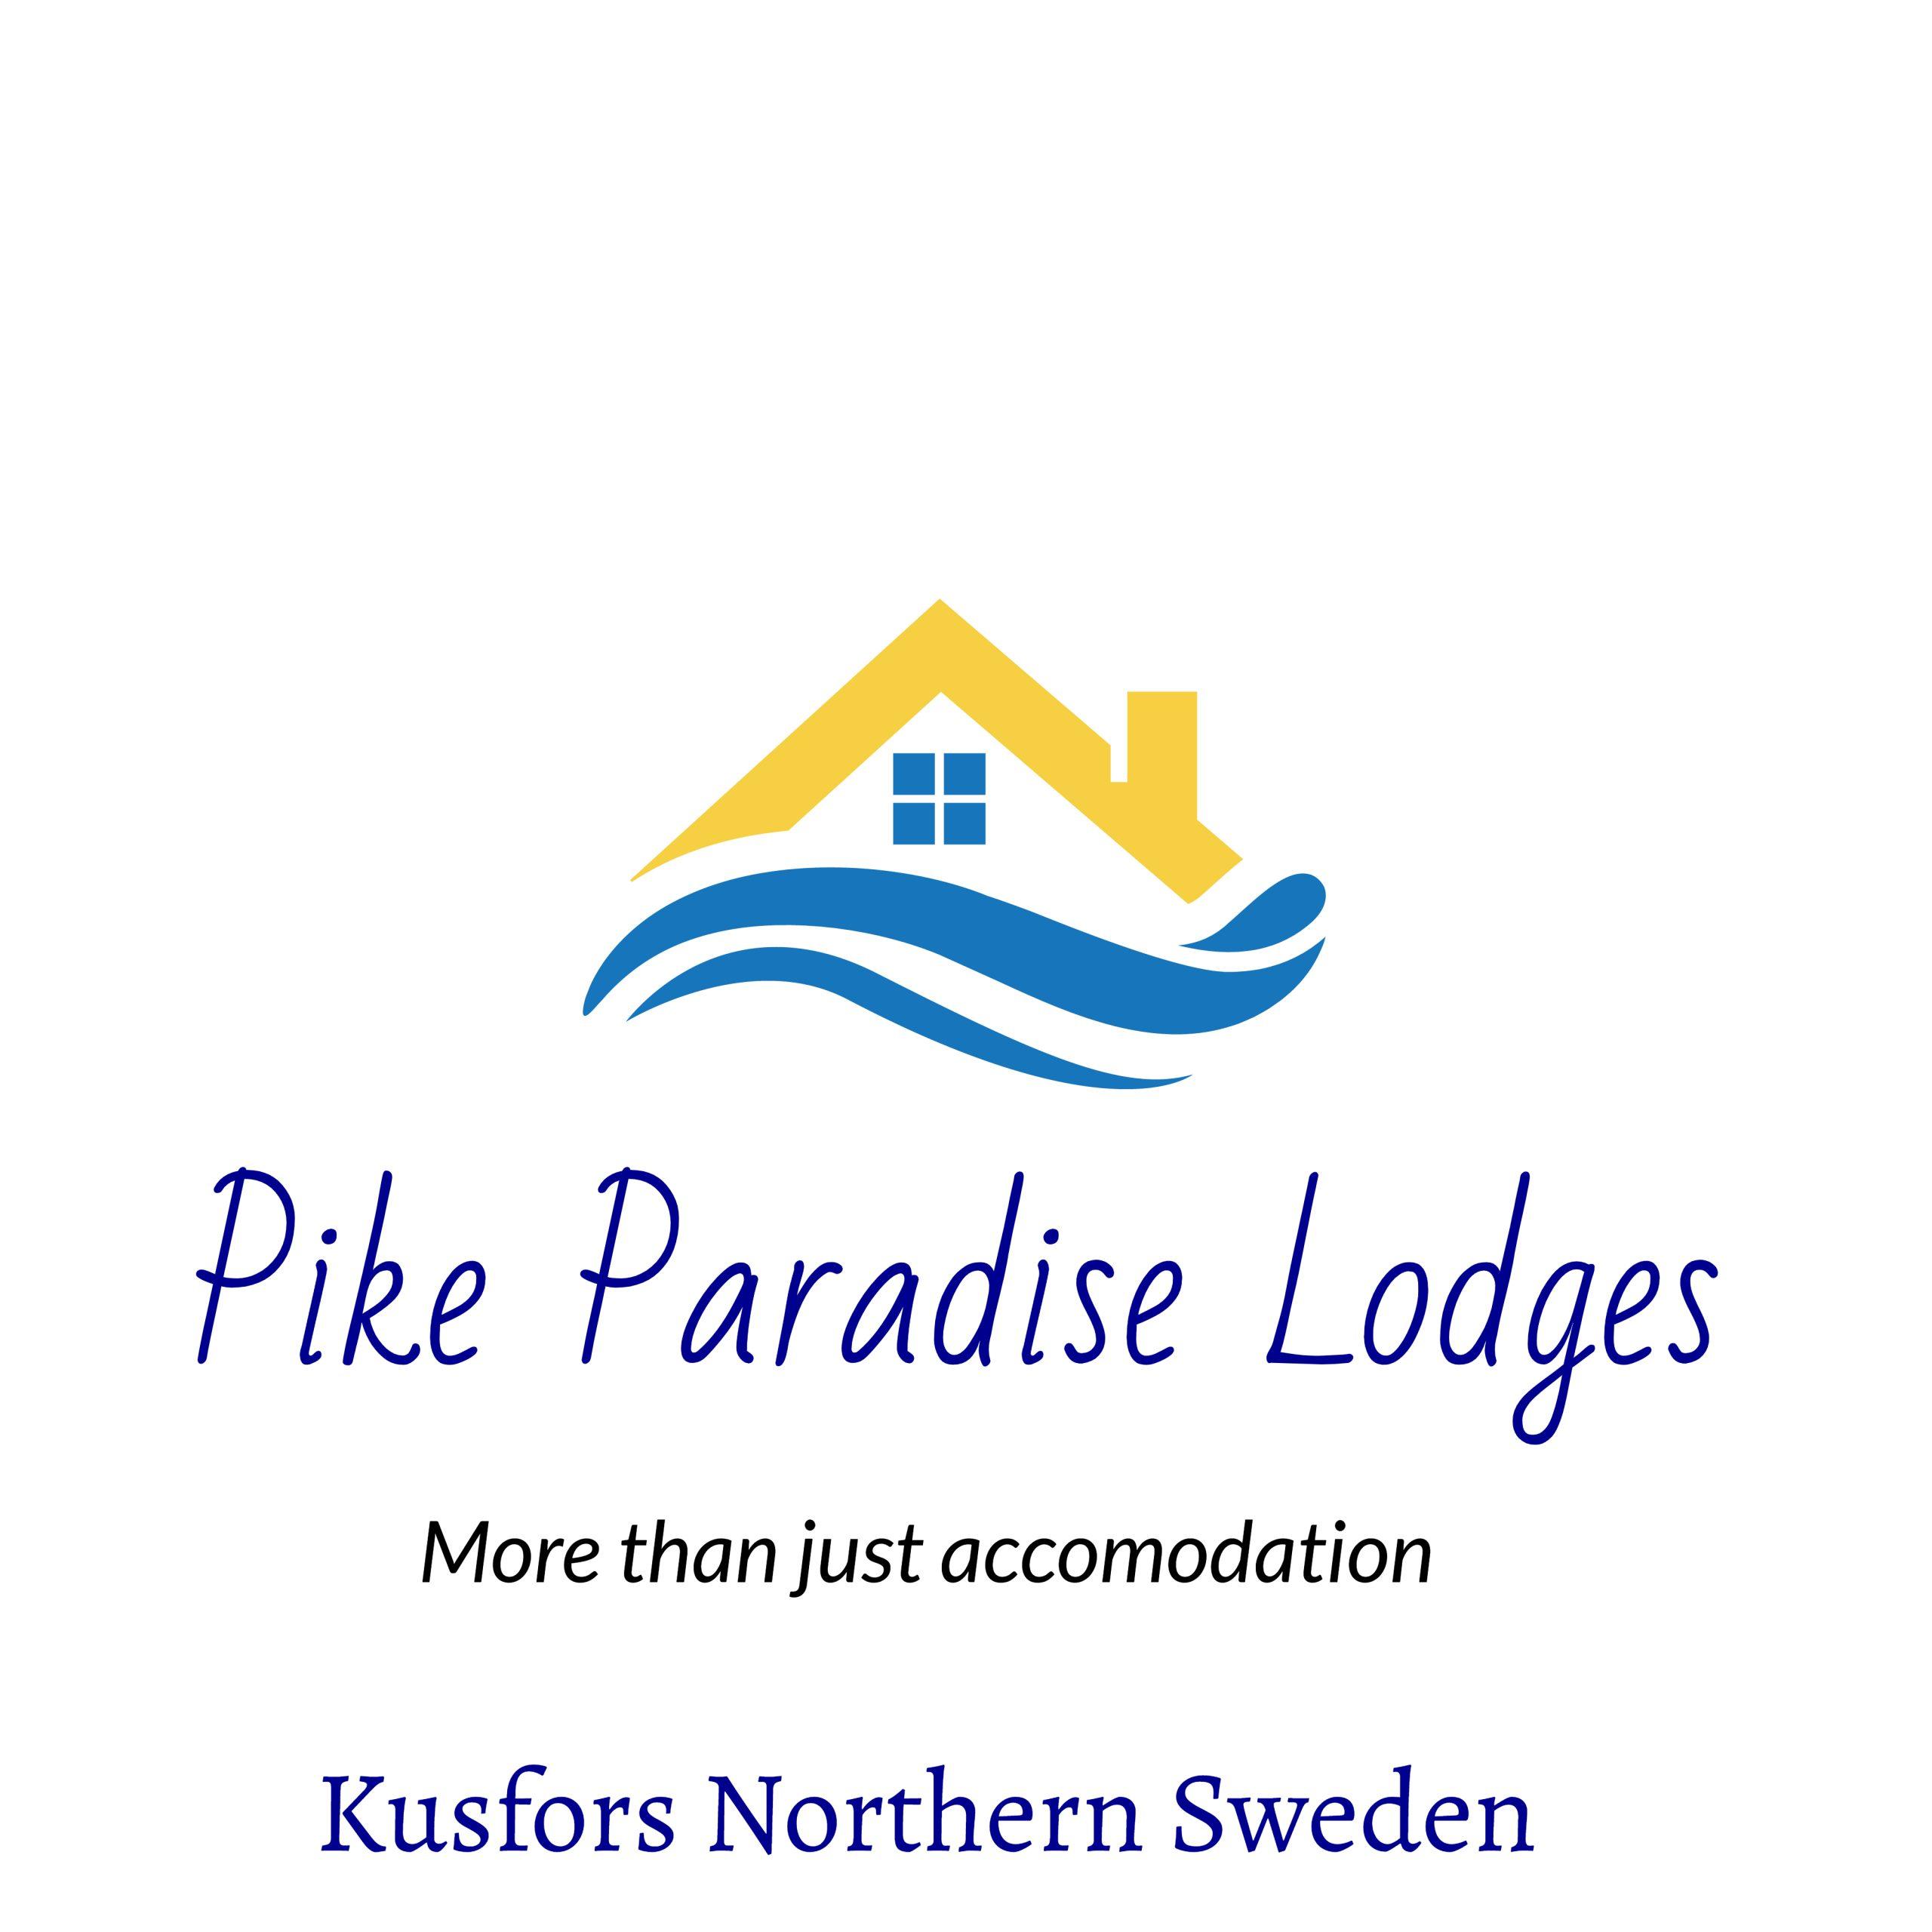 Pike Paradise